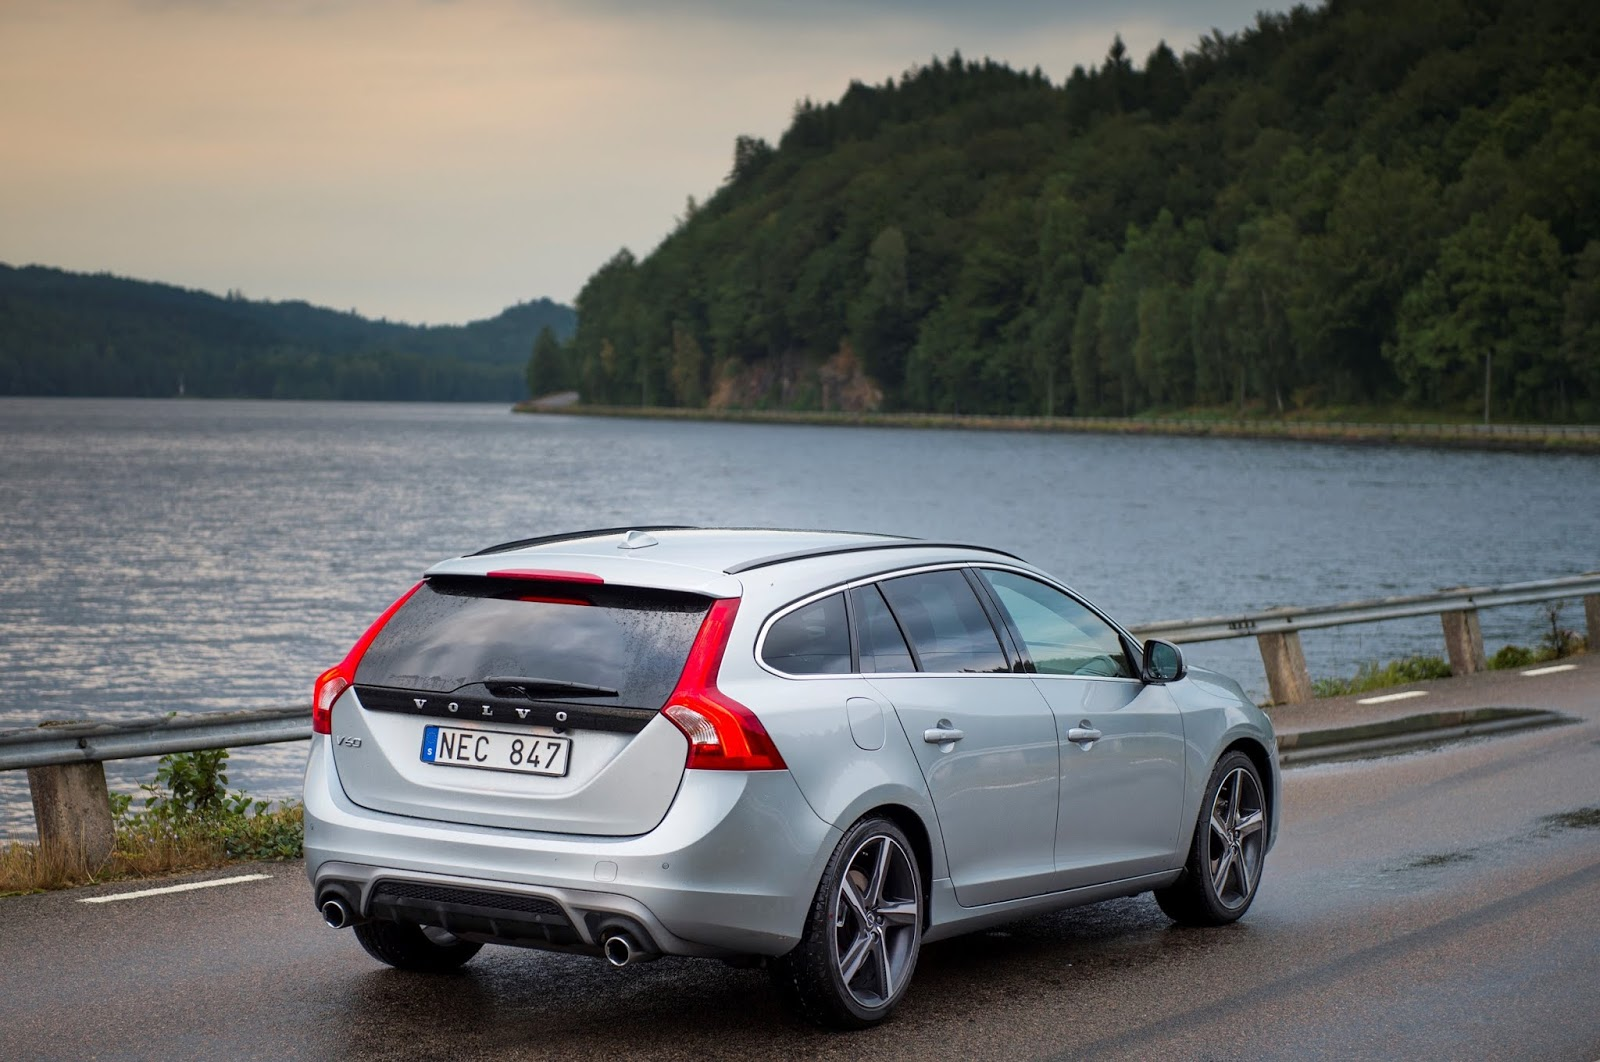 Volvo V60 R Design model year 2016 Προσφορά ως τις 30 Ιουνίου για τα Volvo S60 και V60 Volvo, Volvo S60, Volvo V60